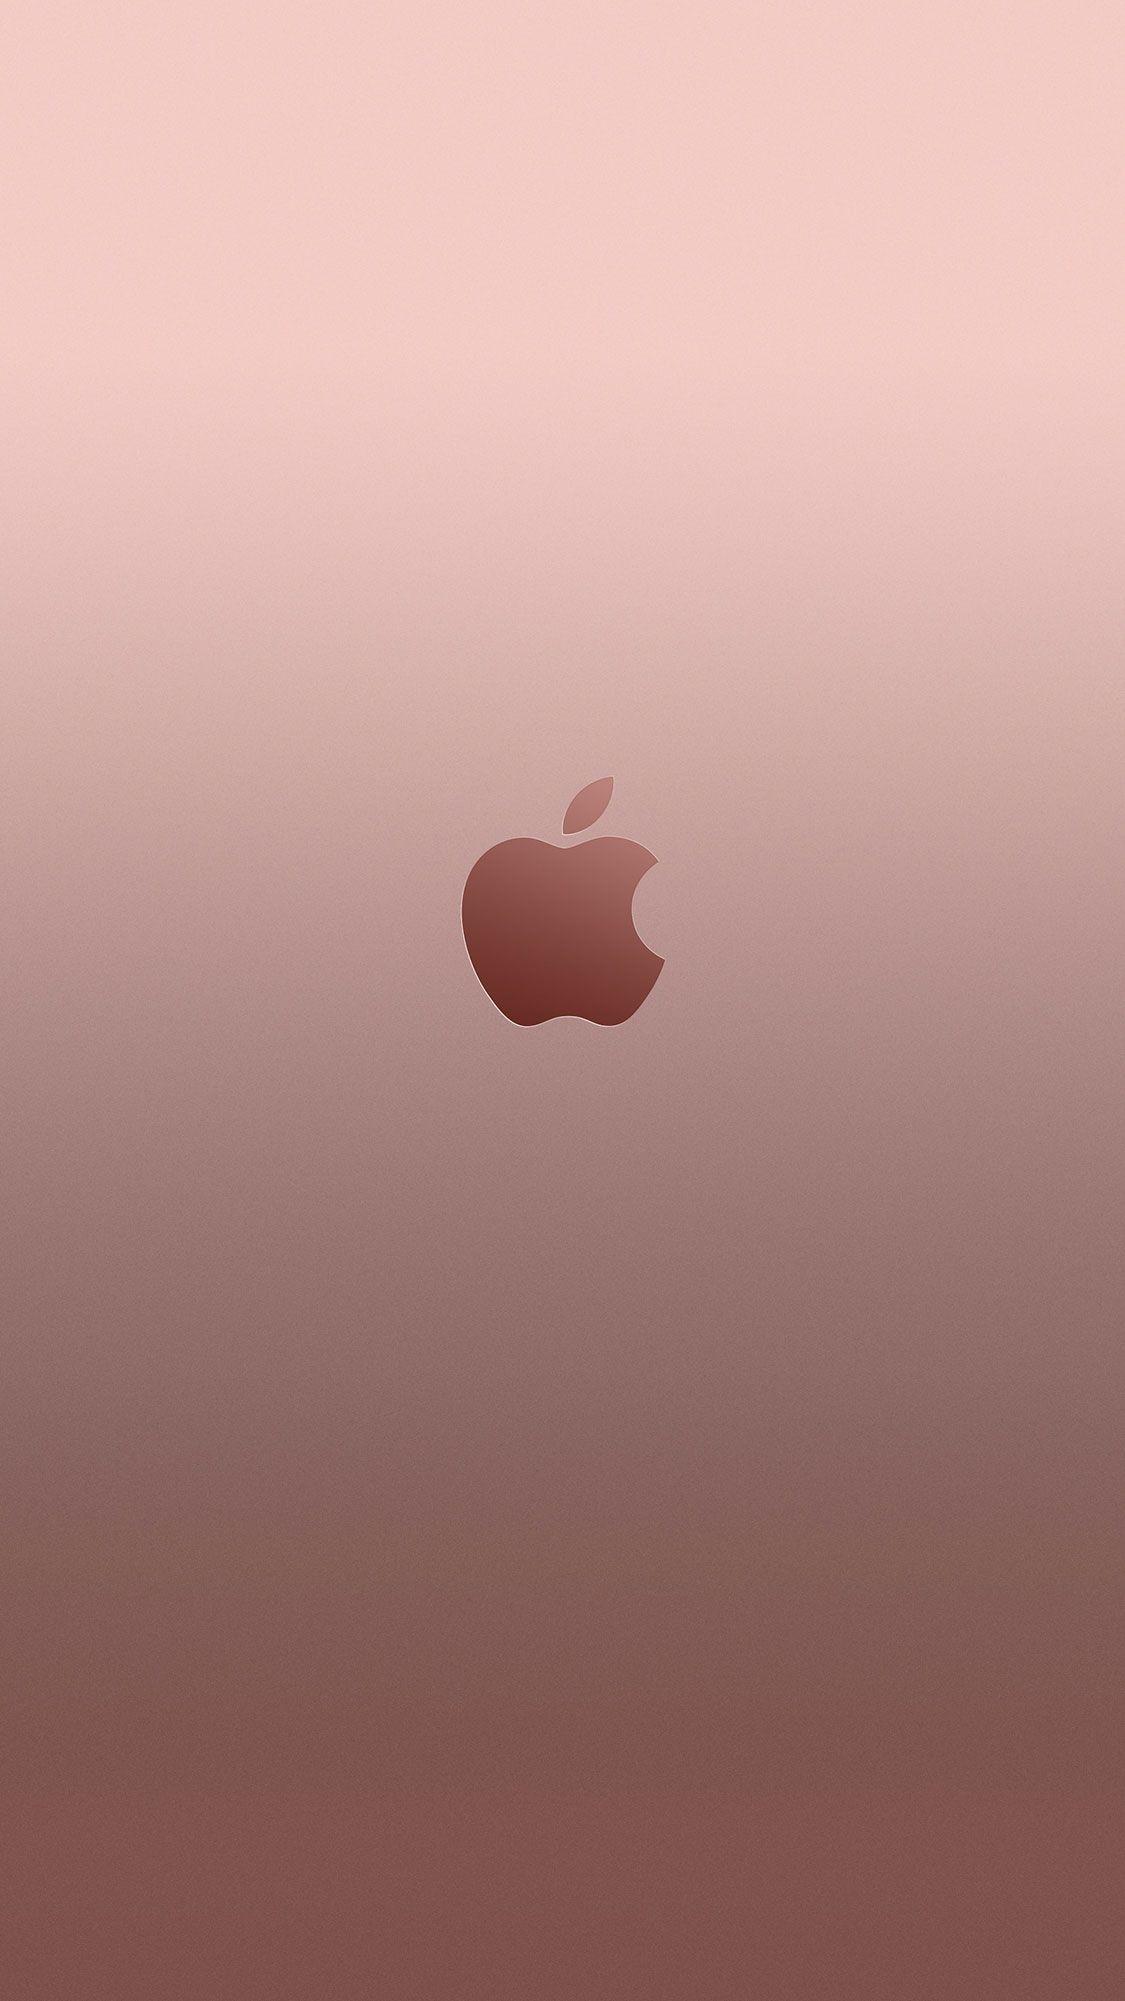 rose-gold--apple-iphone-6s-wallpaper | modeling | pinterest | Écran